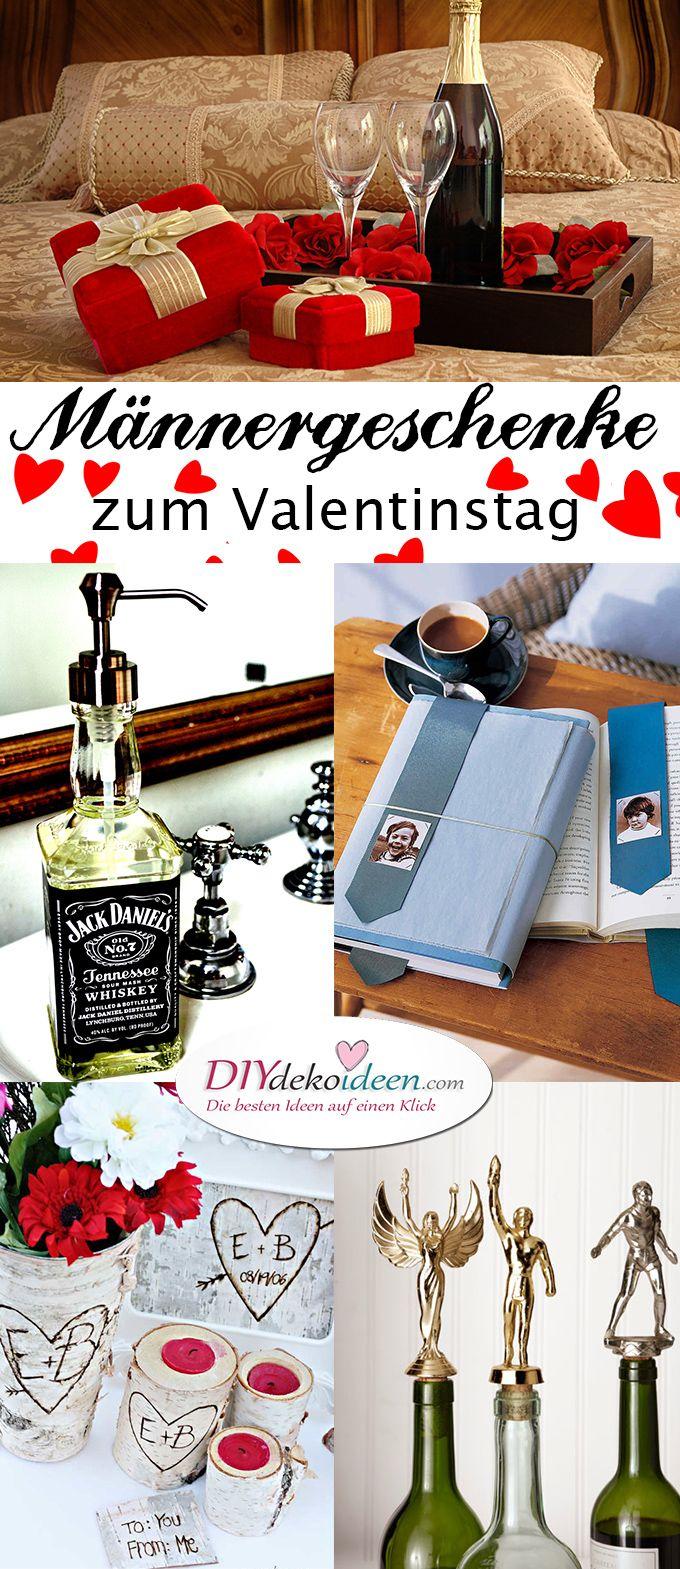 Kreative Diy Bastelideen Fur Mannergeschenke Zum Valentinstag Diy Valentinstag Fur Ihn Valentinstag Geschenk Basteln Geschenke Basteln